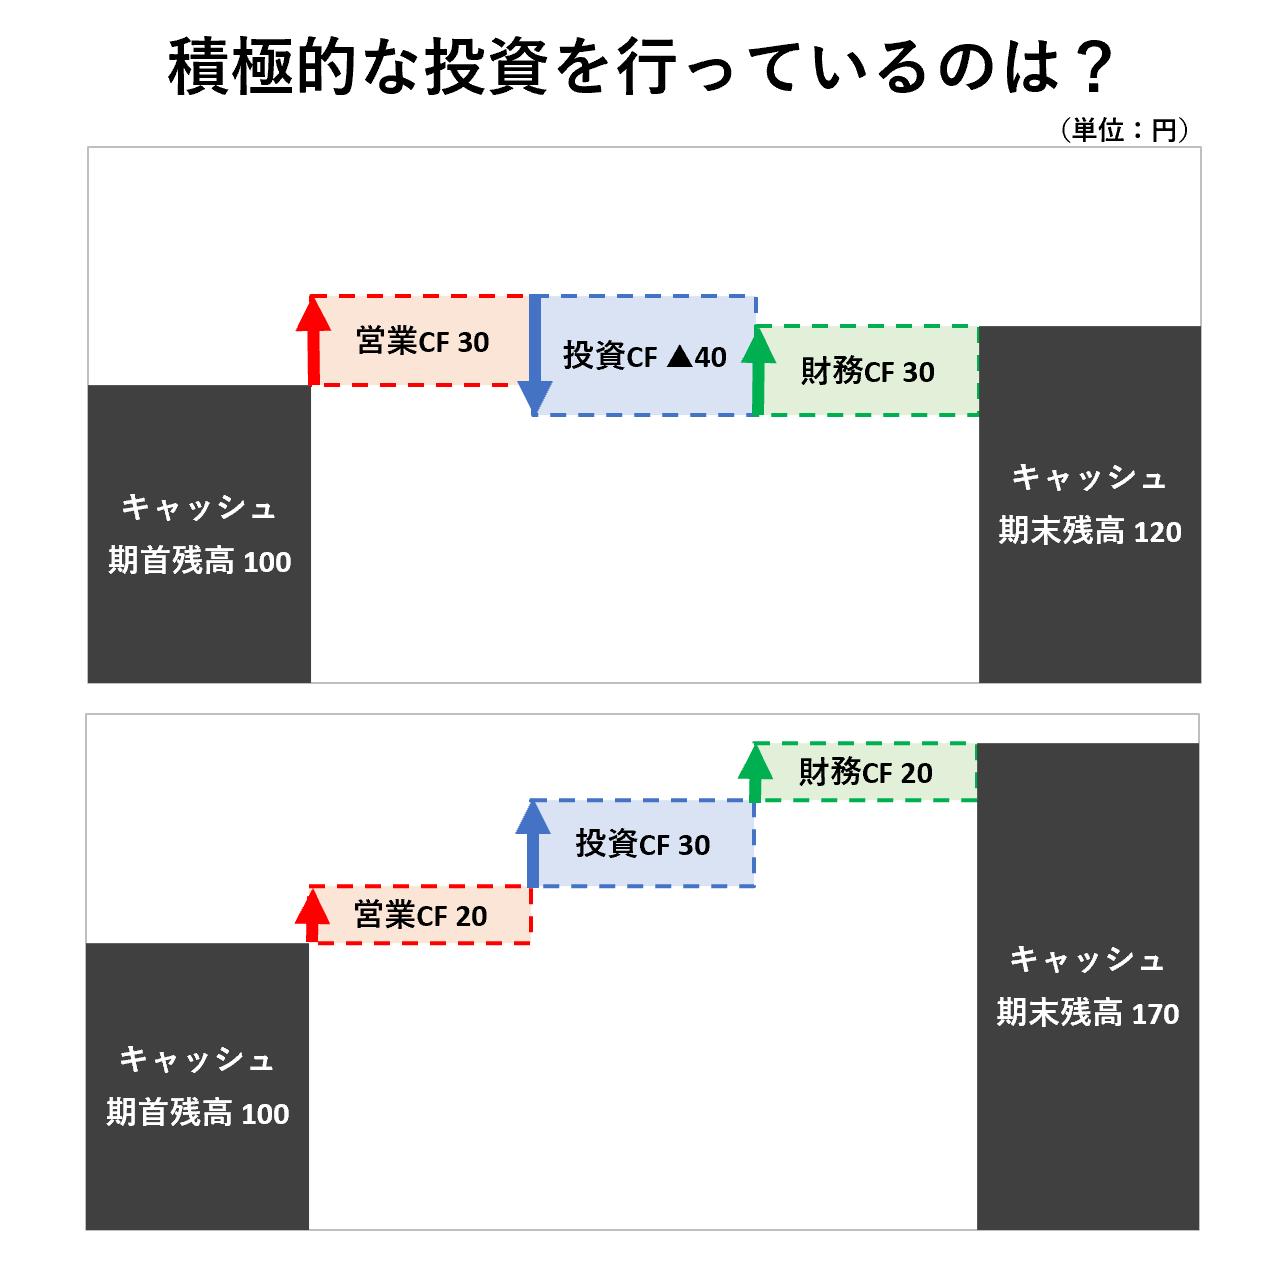 CF分析:CFの循環パターン③ー問題